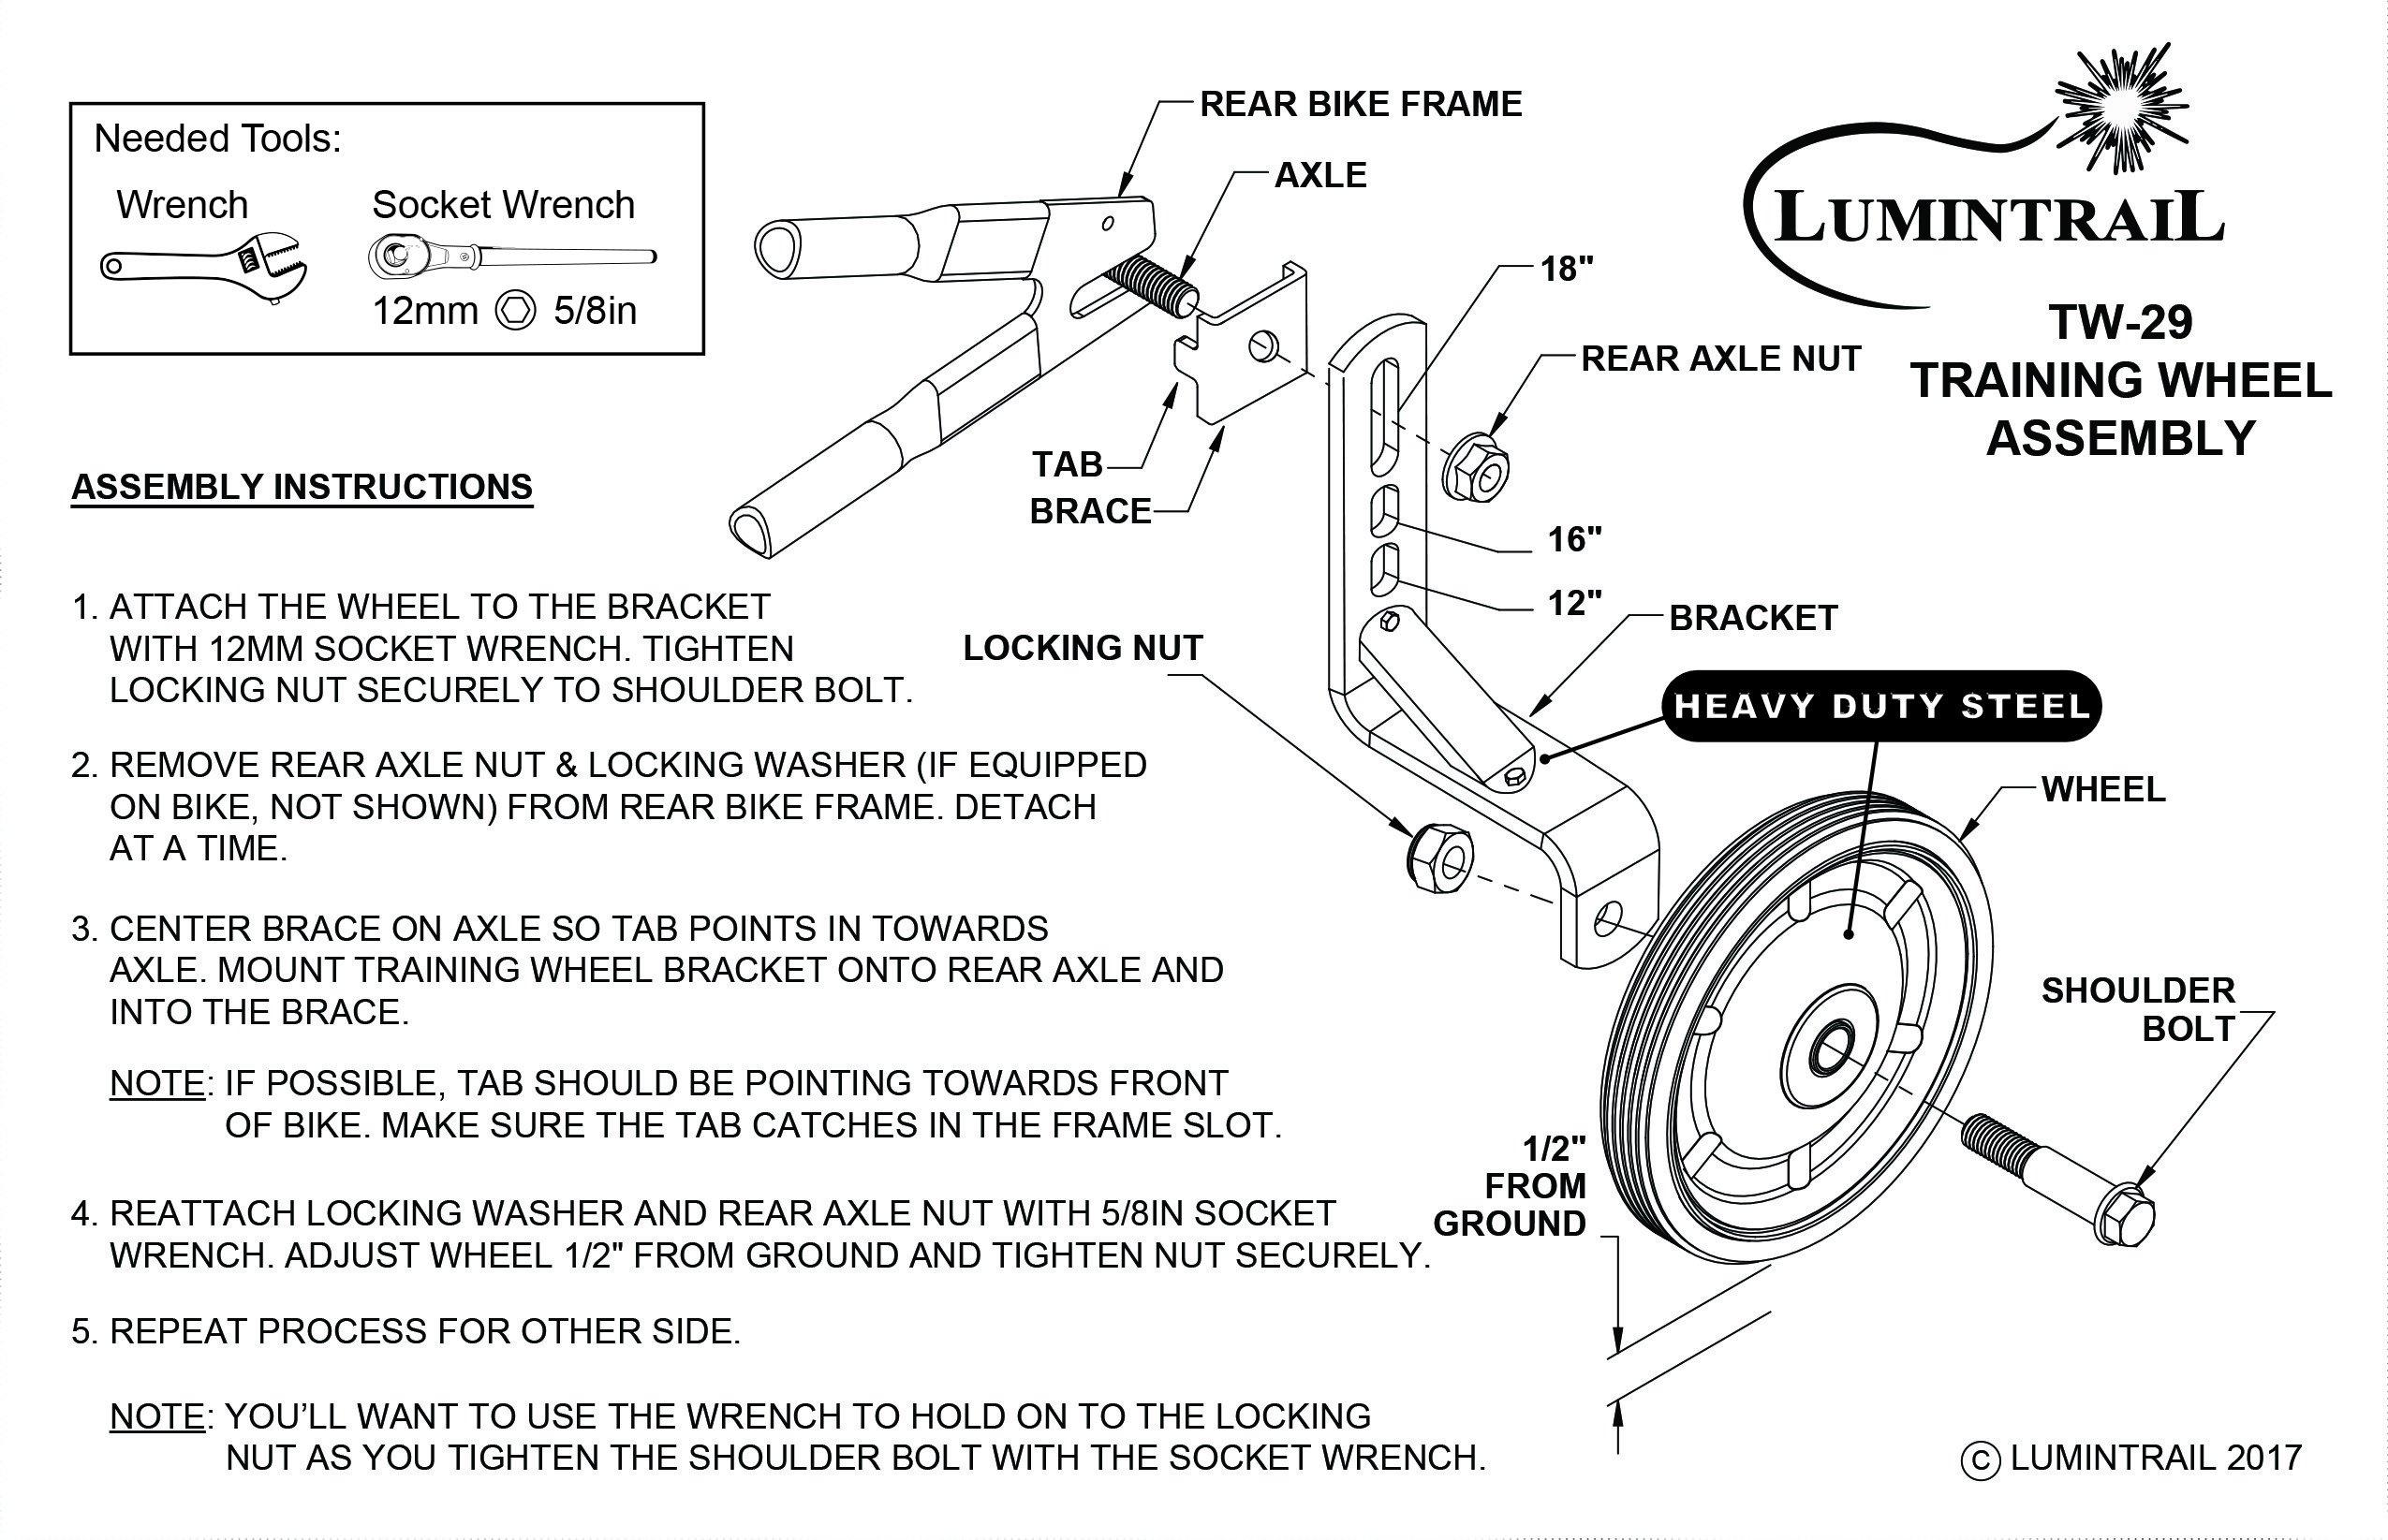 Lumintrail Children's Bicycle Training Wheels 12-18 Inch Kids Bike Stabilizer by Lumintrail (Image #5)